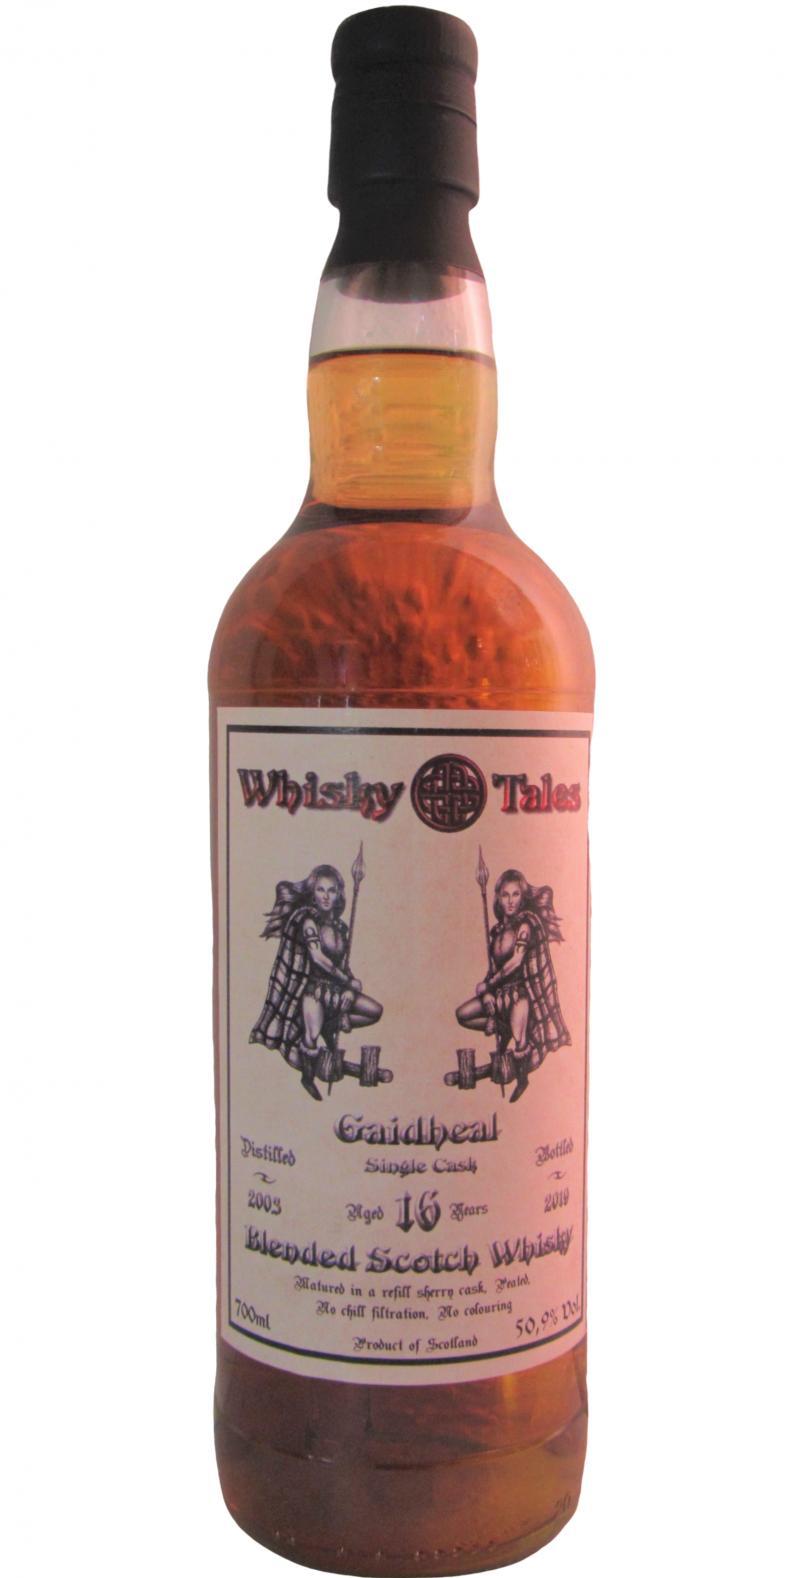 Blended Scotch Whisky 2003 WT